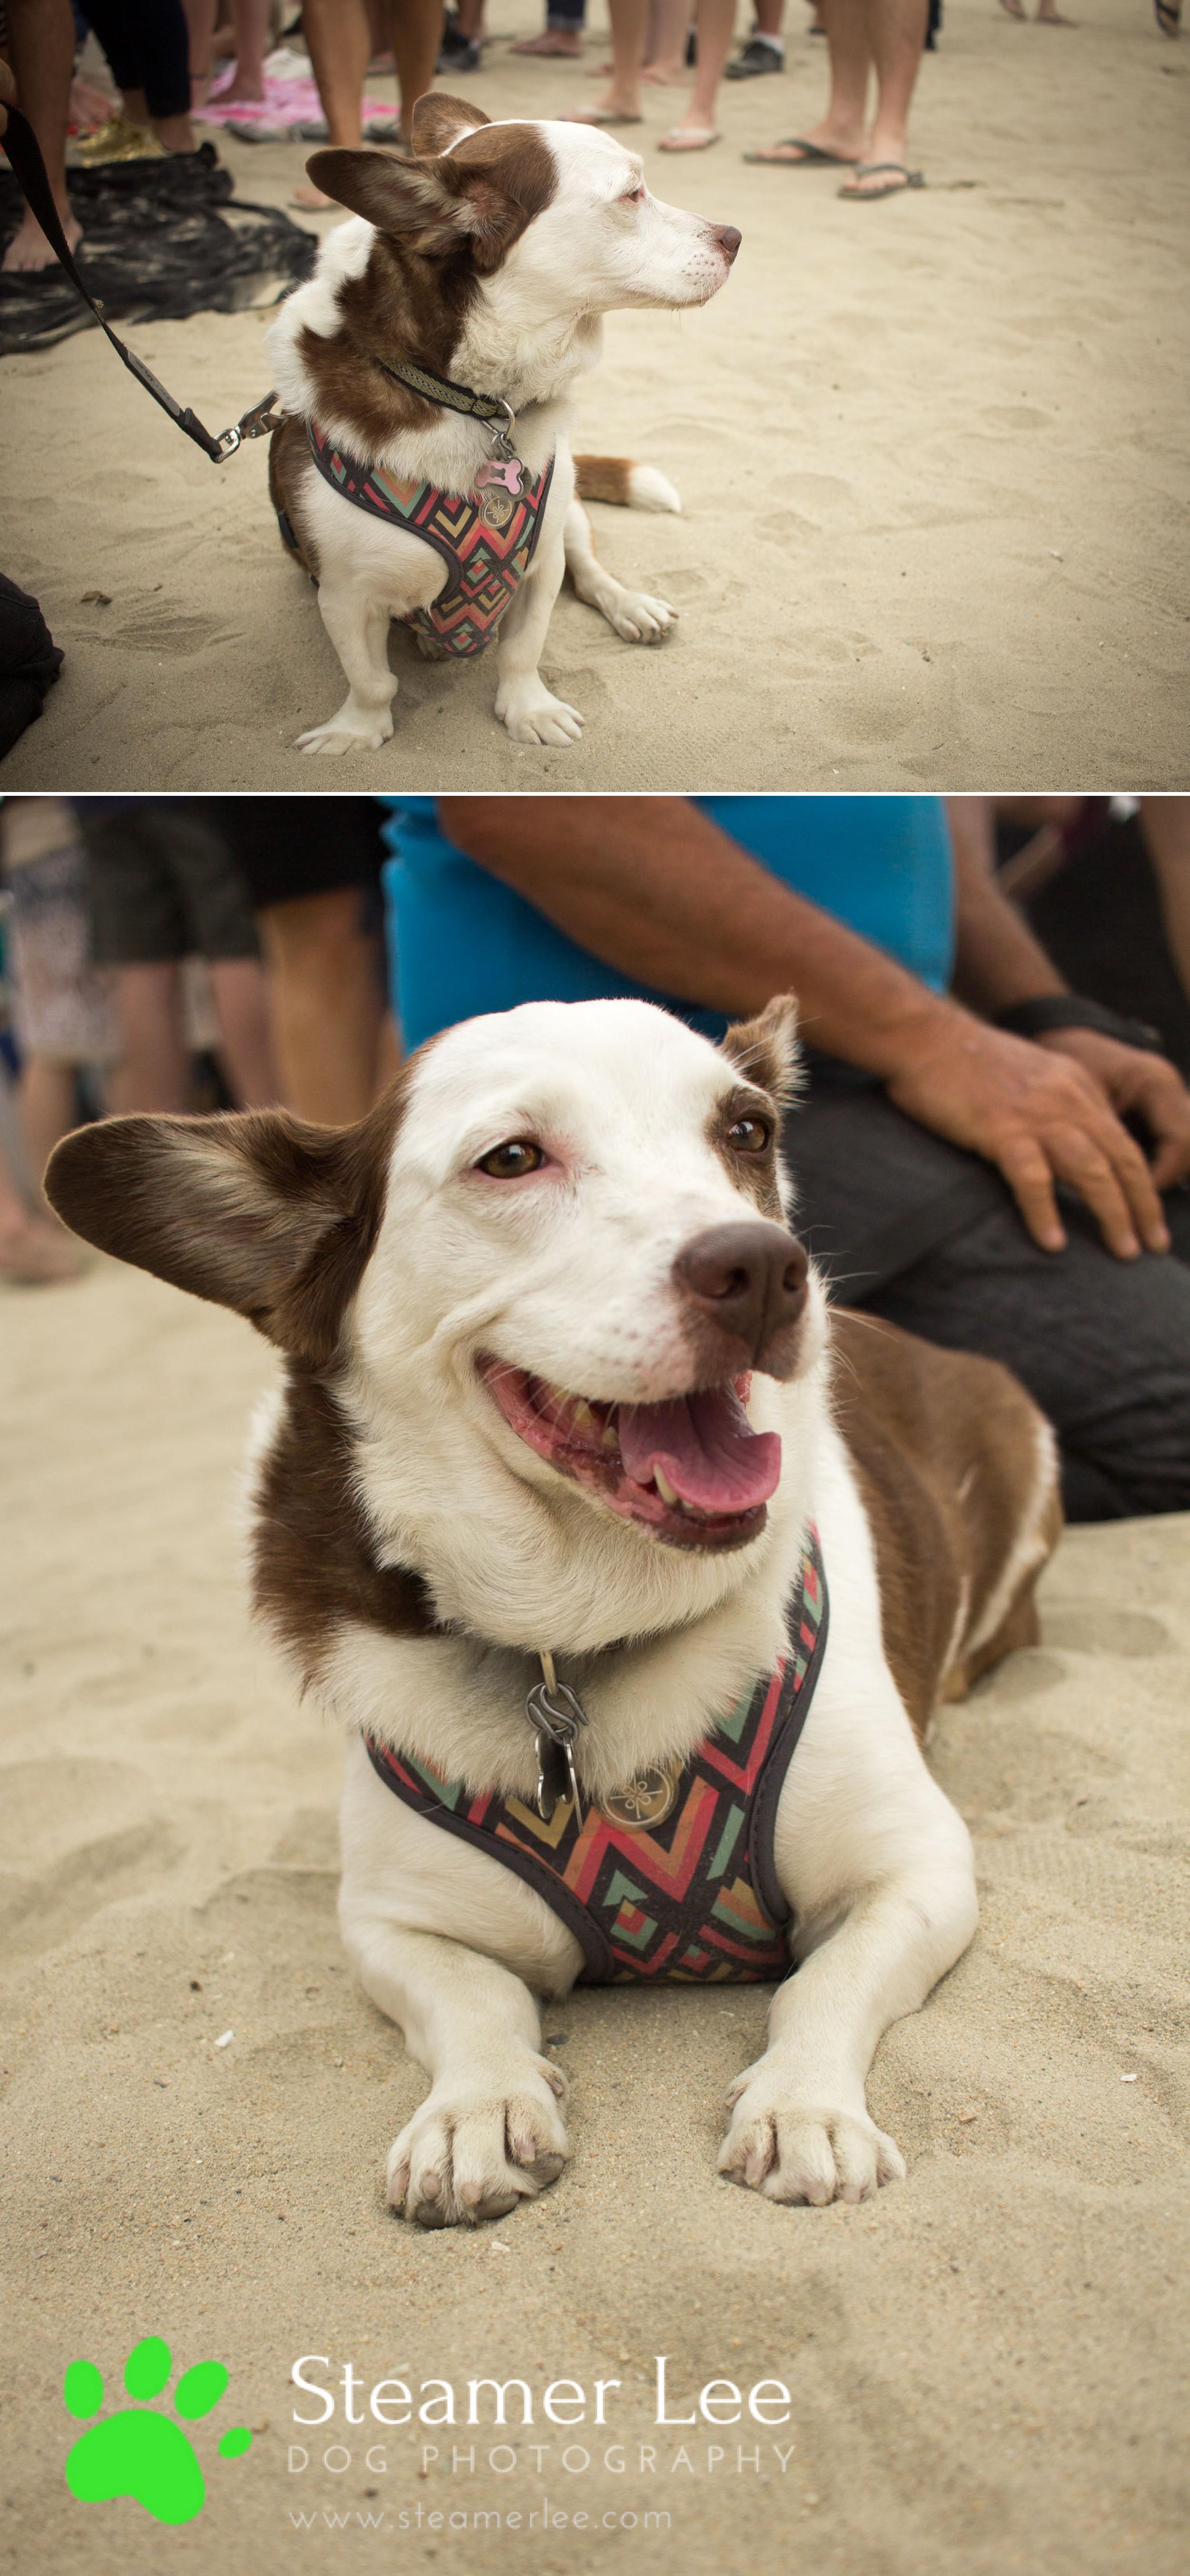 Steamer Lee Dog Photography - July 2017 So Cal Corgi Beach Day - Vol.2 - 15.jpg